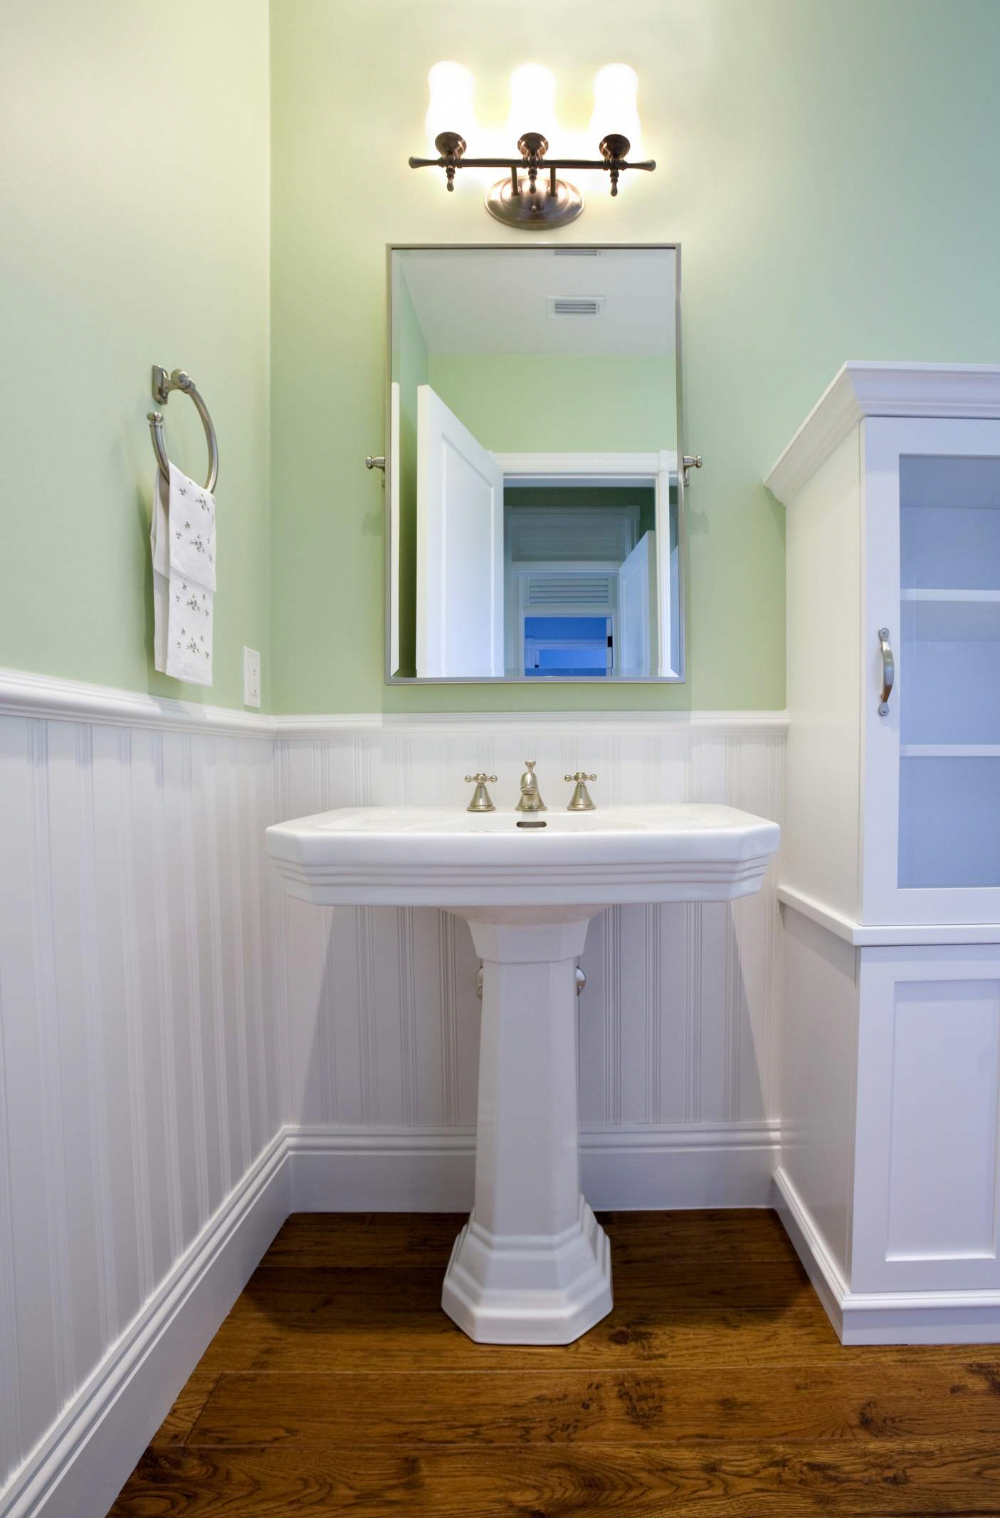 A Small Bathroom Needs the Right Sink #nauticalbathroom